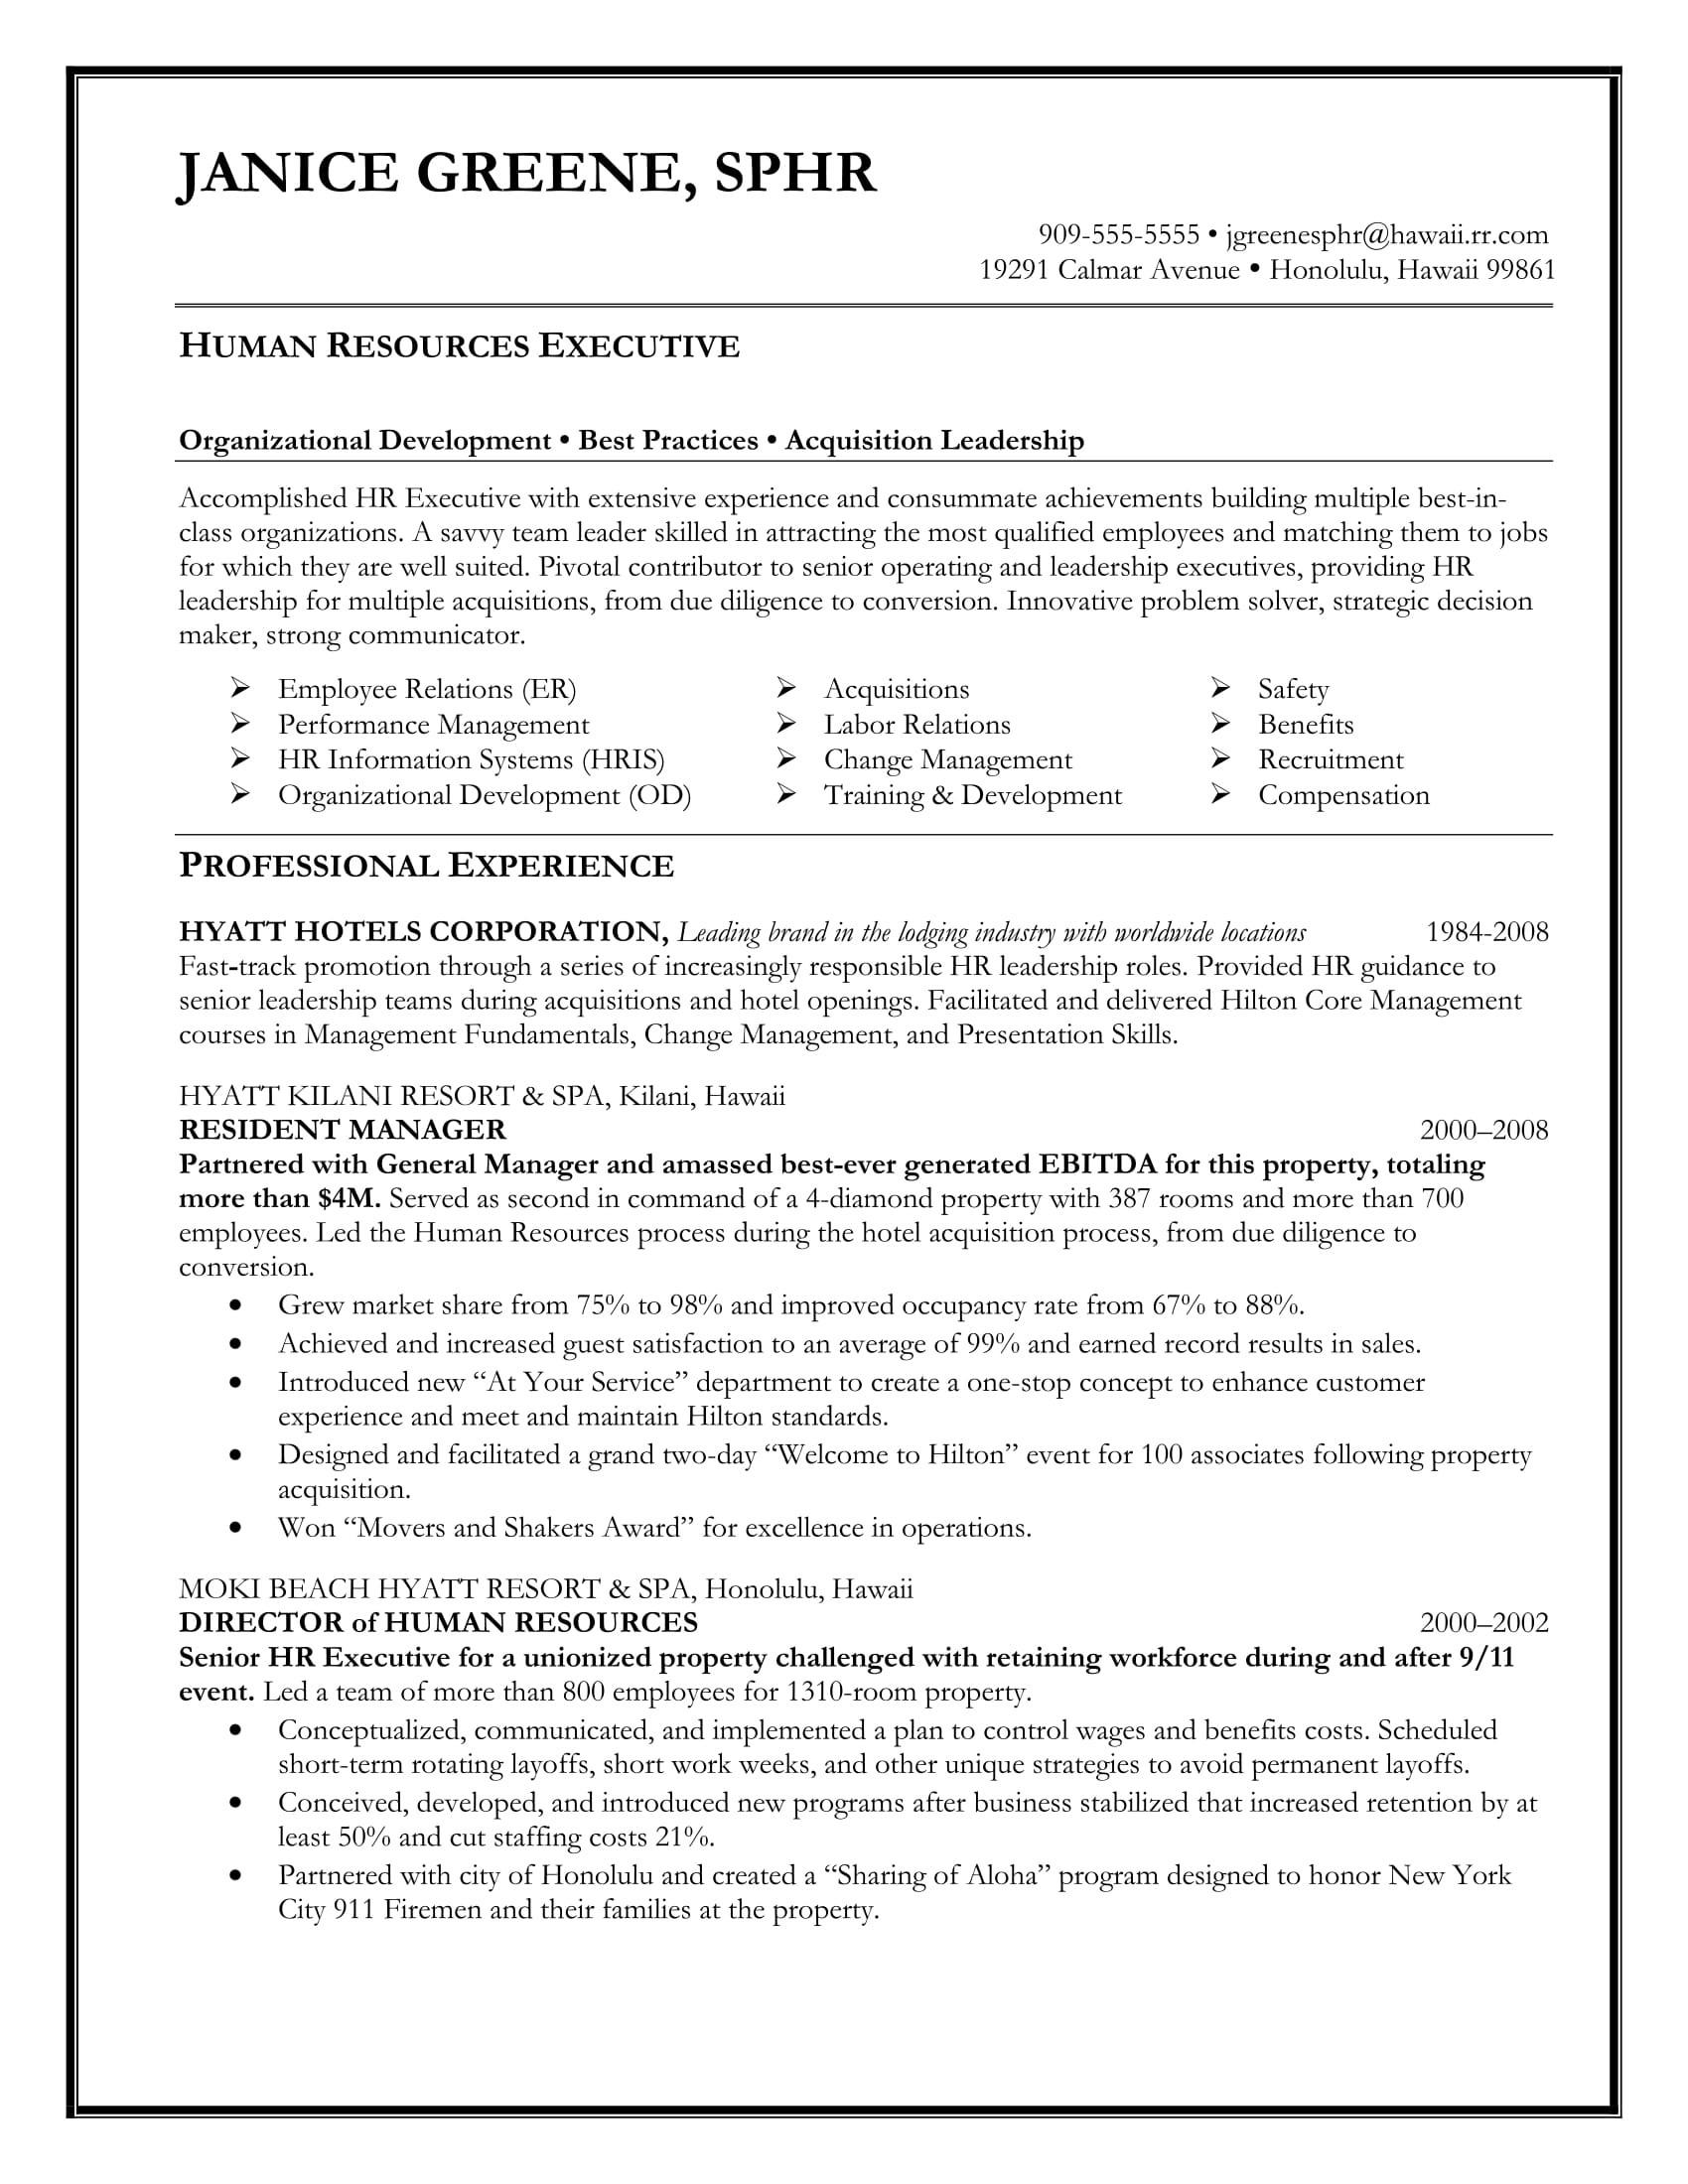 sample executive resume templates